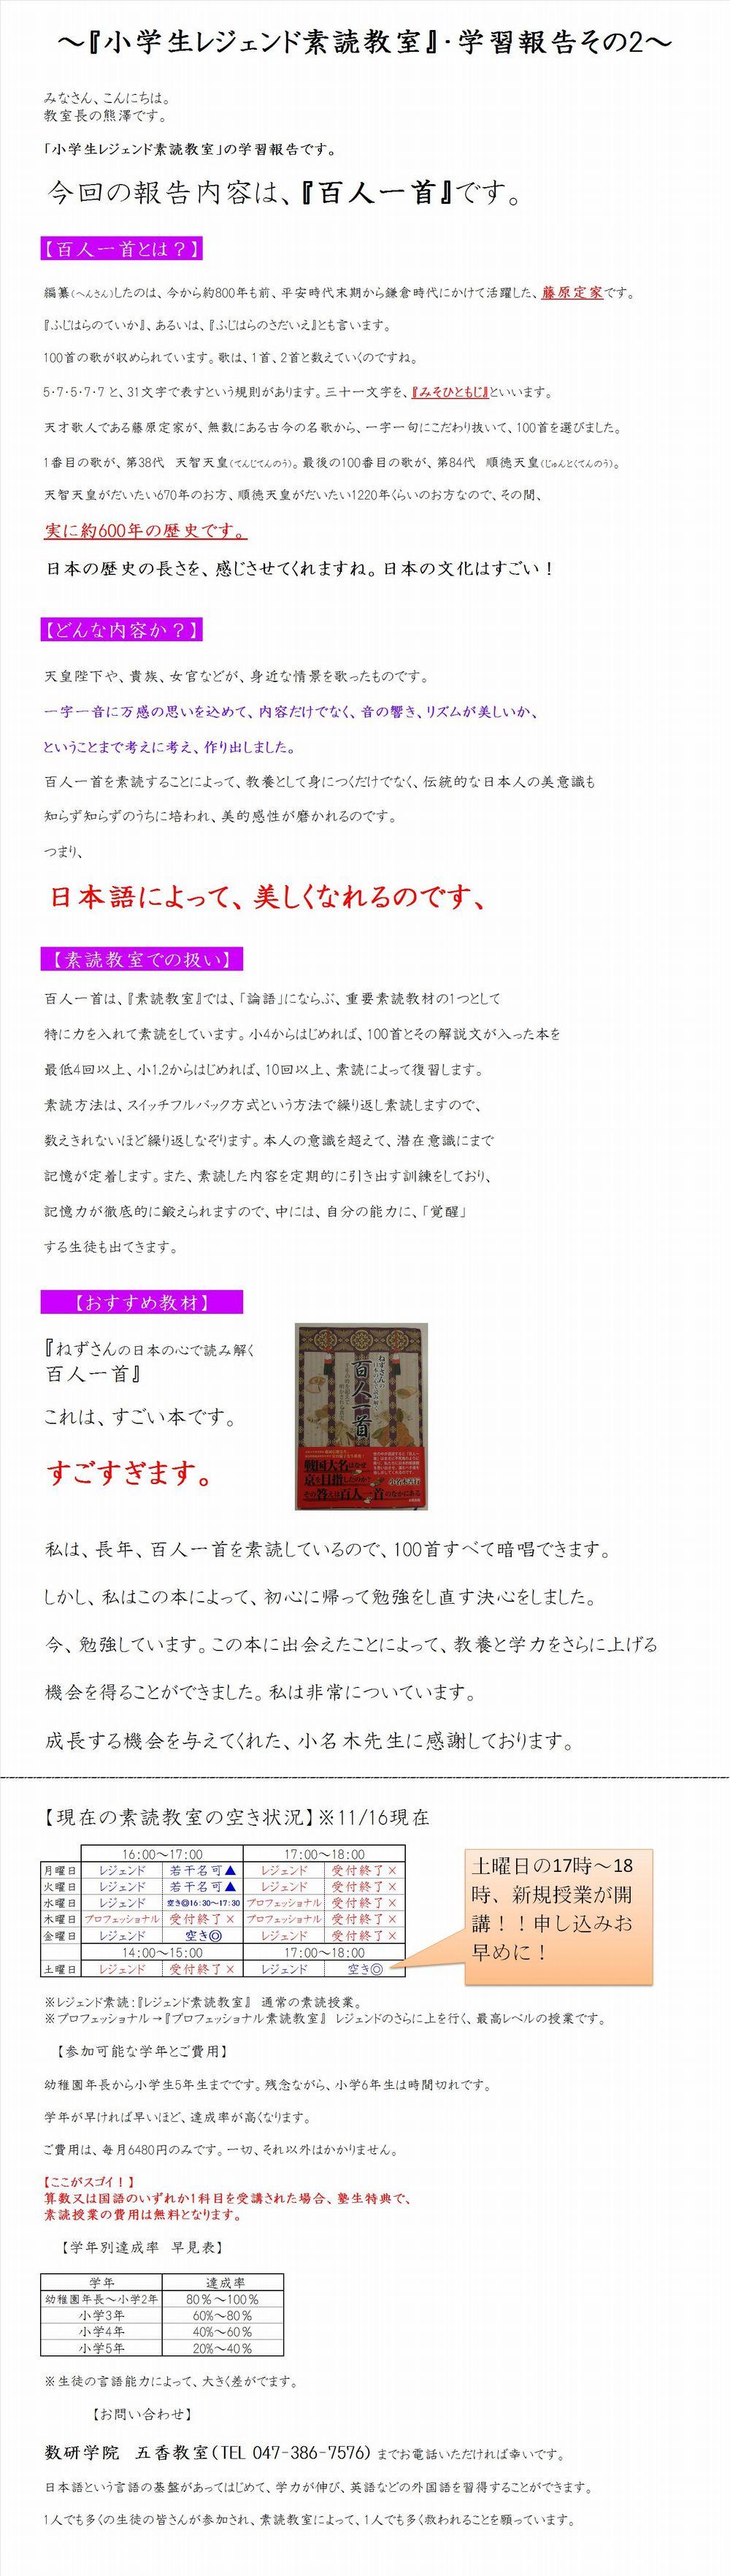 HP素読その4報告2百人一首1